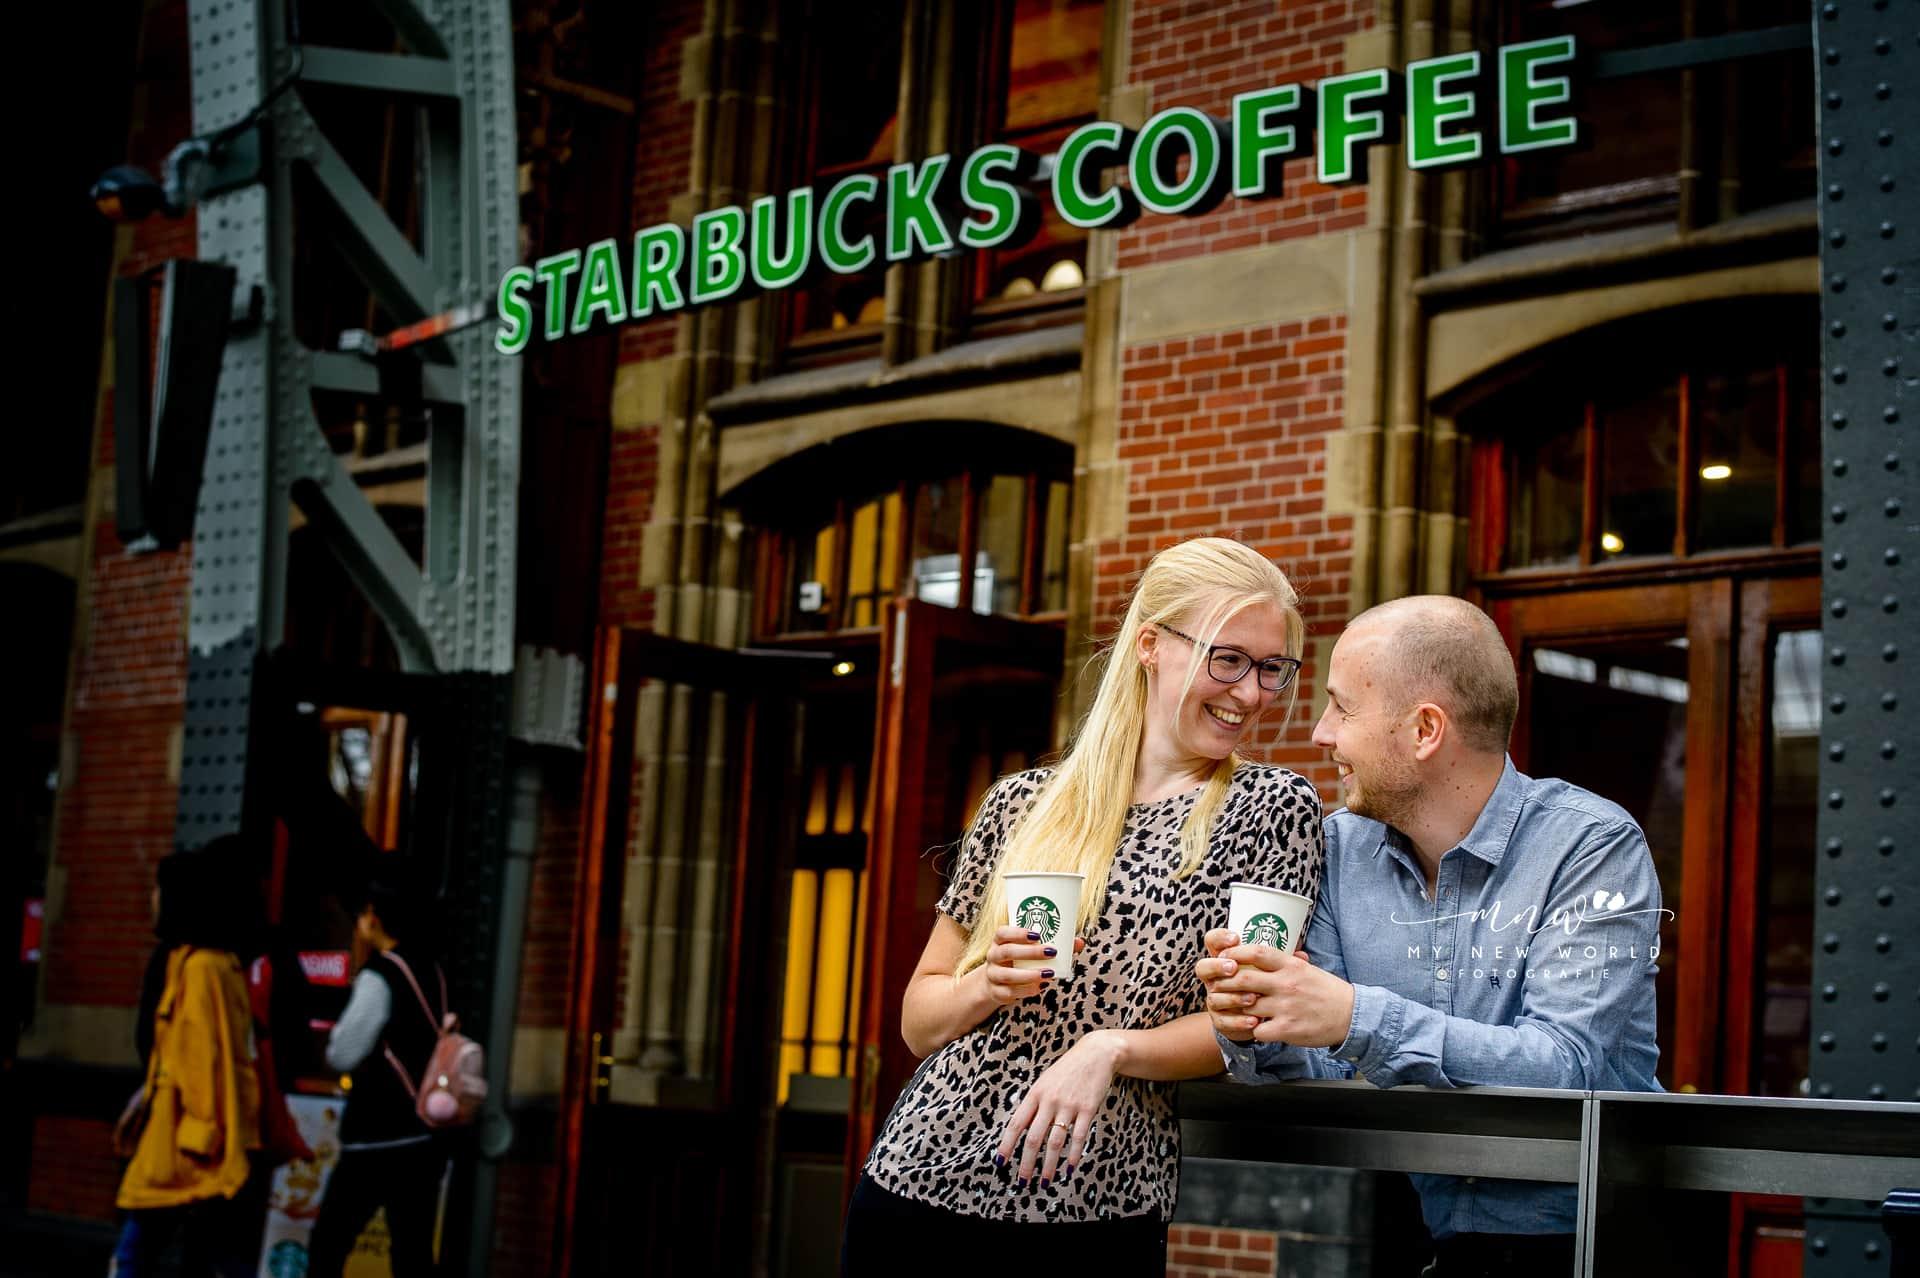 Starbucks always a good idea